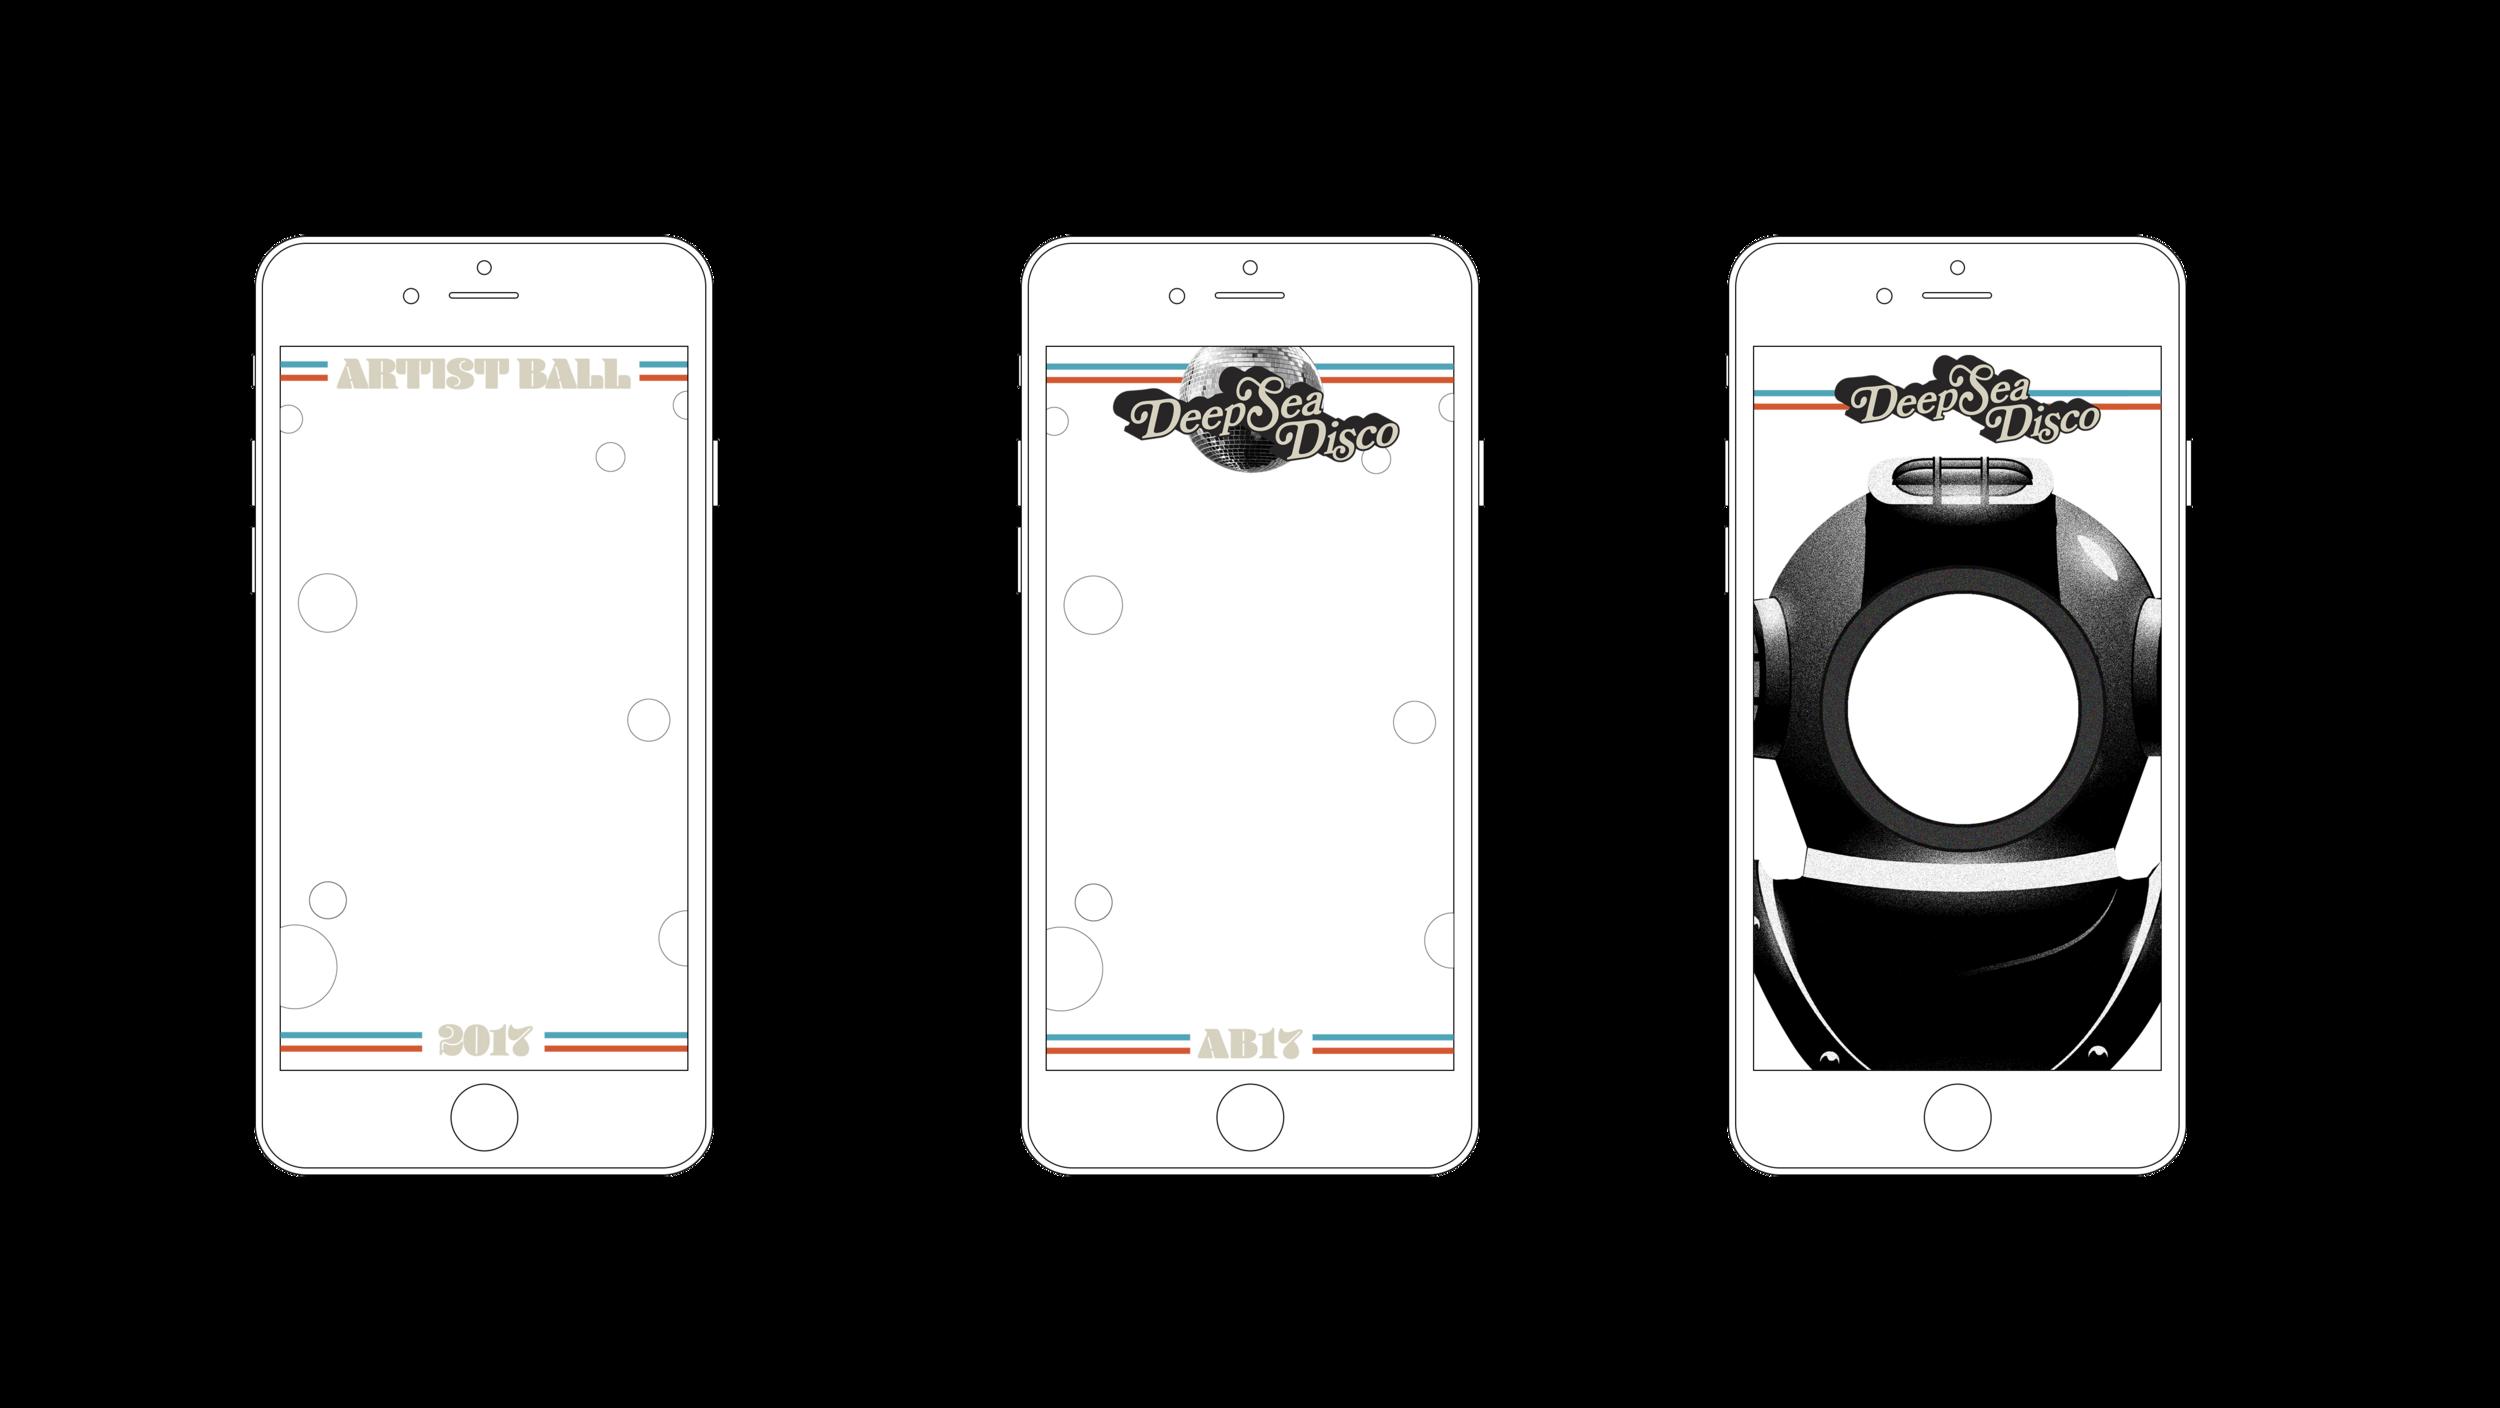 Snapchat filters designed by Stephanie Winarto